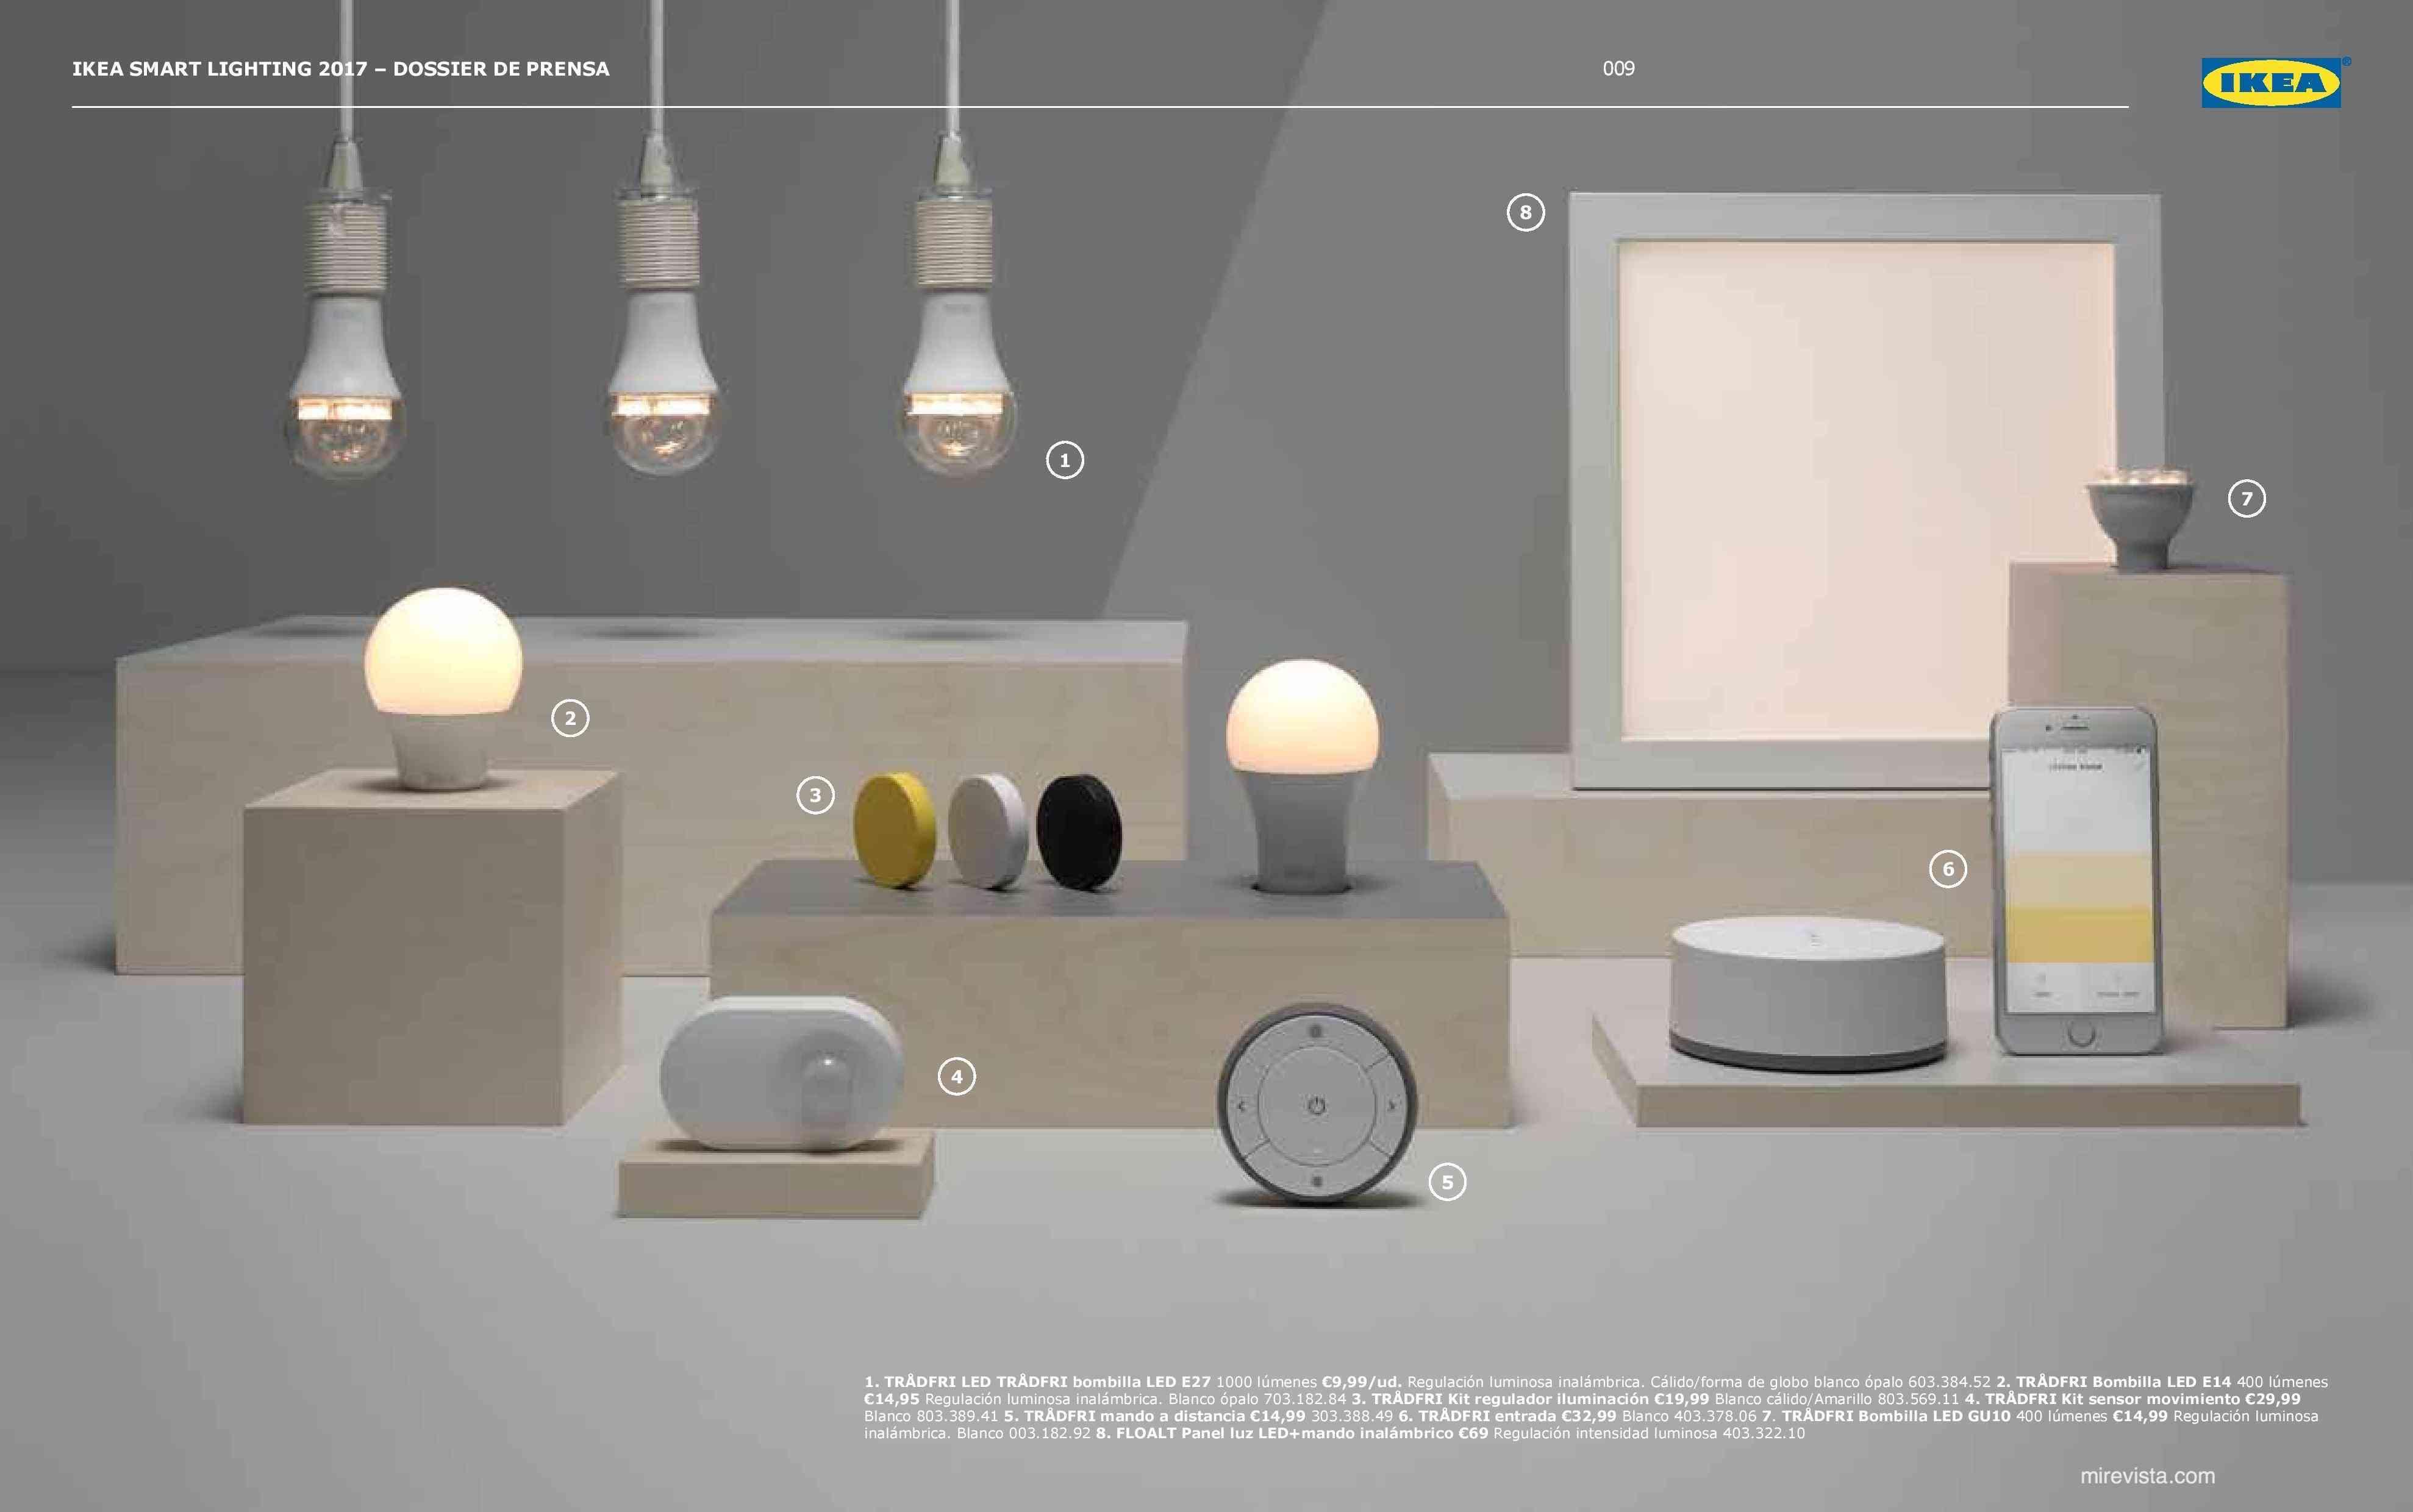 Novedades en iluminación de casas inteligentes con IKEA 65